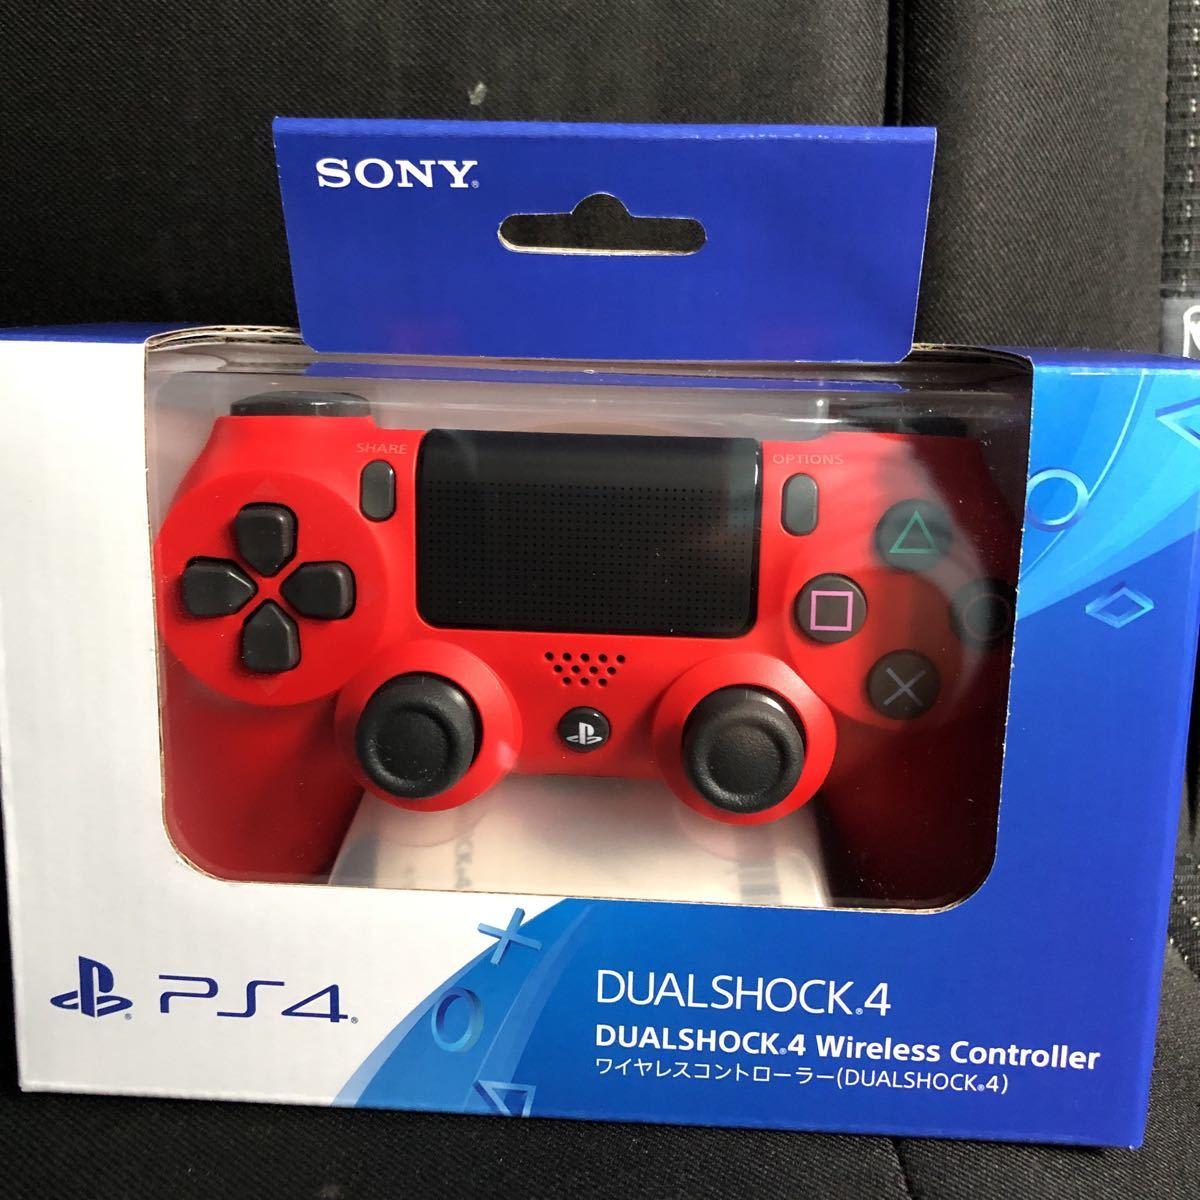 PS4コントローラー ワイヤレスコントローラー DUALSHOCK4 SONY 保証有り